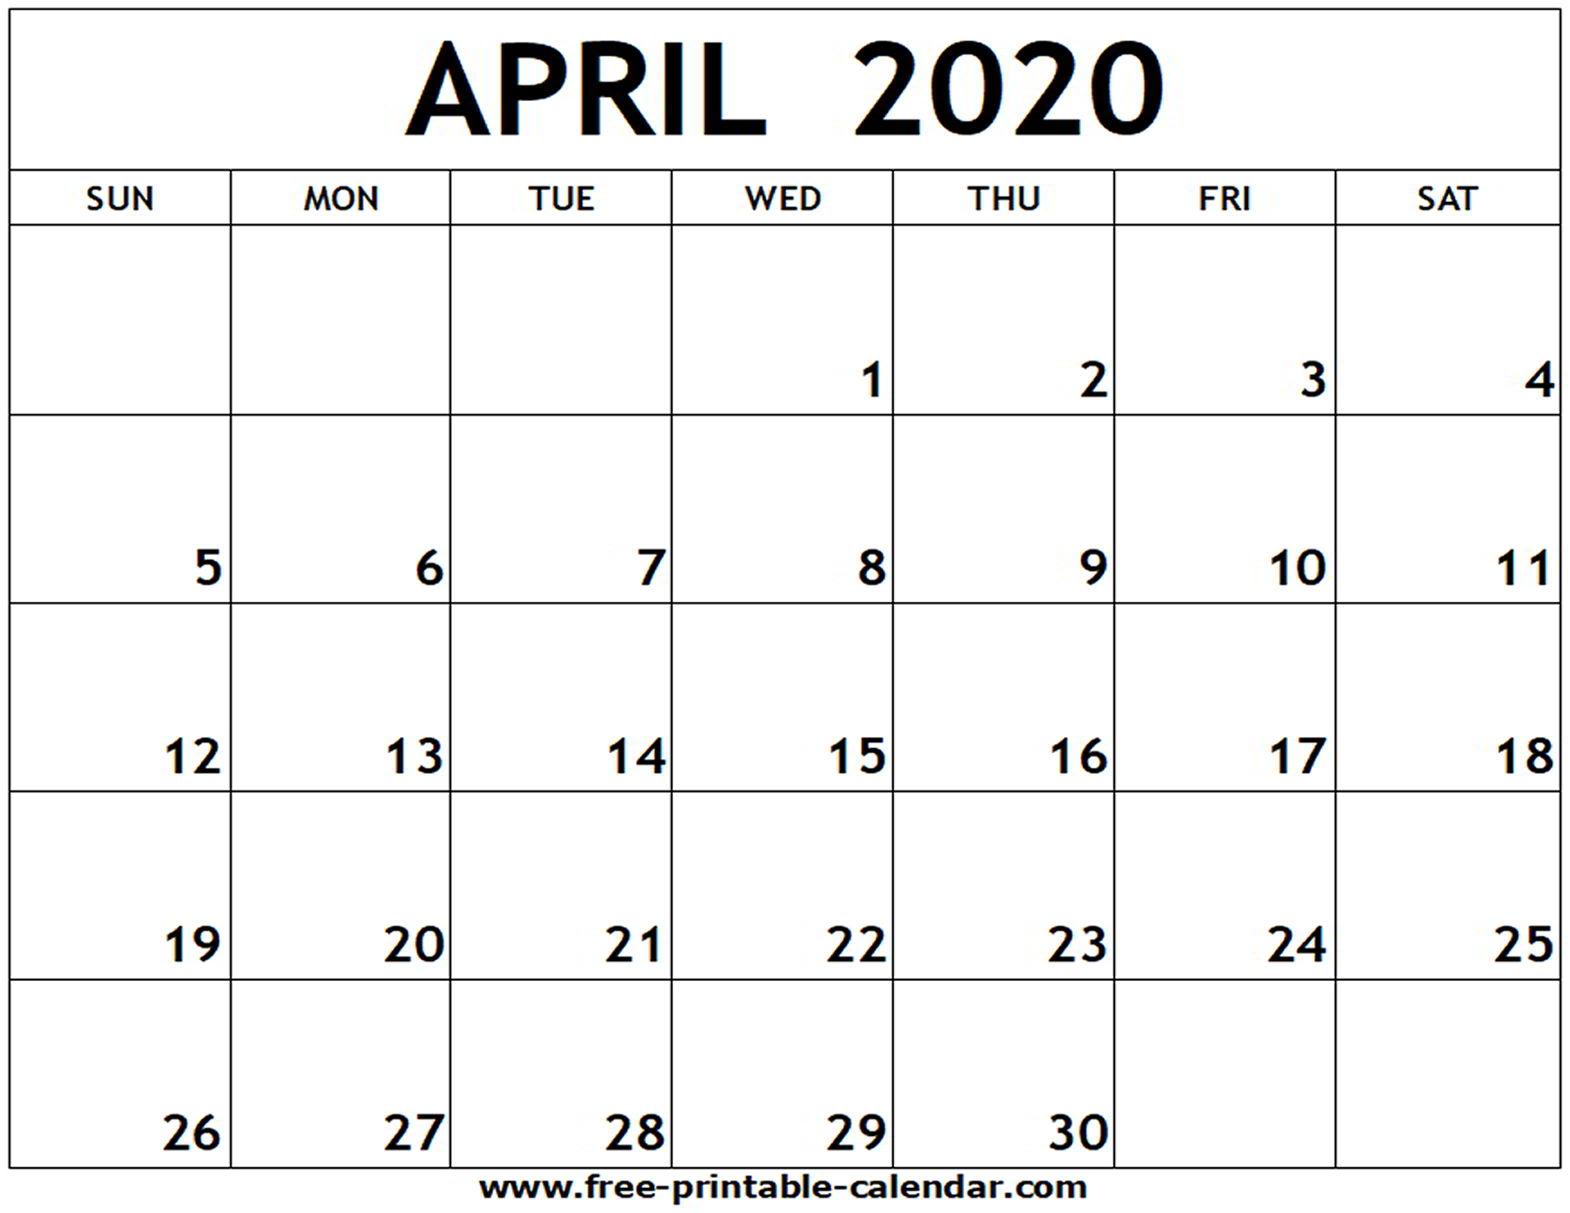 Printable Calendars April 2020  Bolan.horizonconsulting.co regarding Free Printable April 2020 Calendar